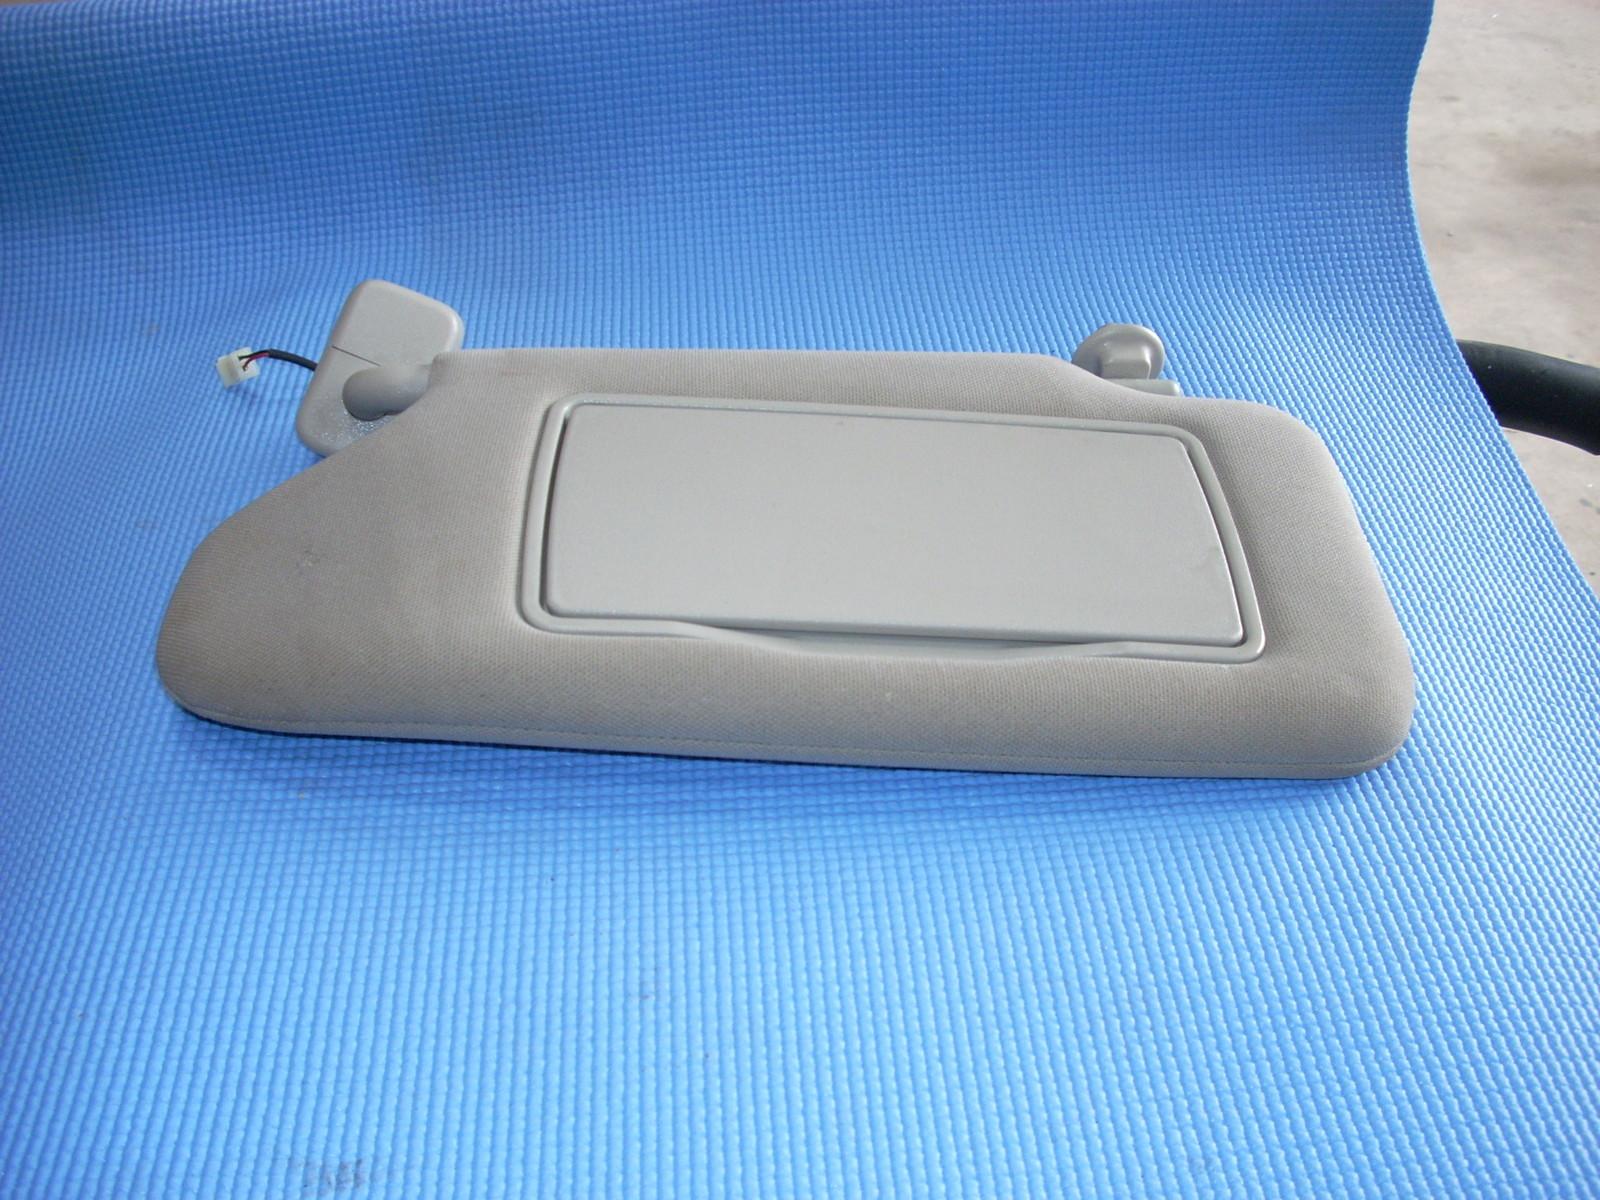 Nissan Altima: Sun visors